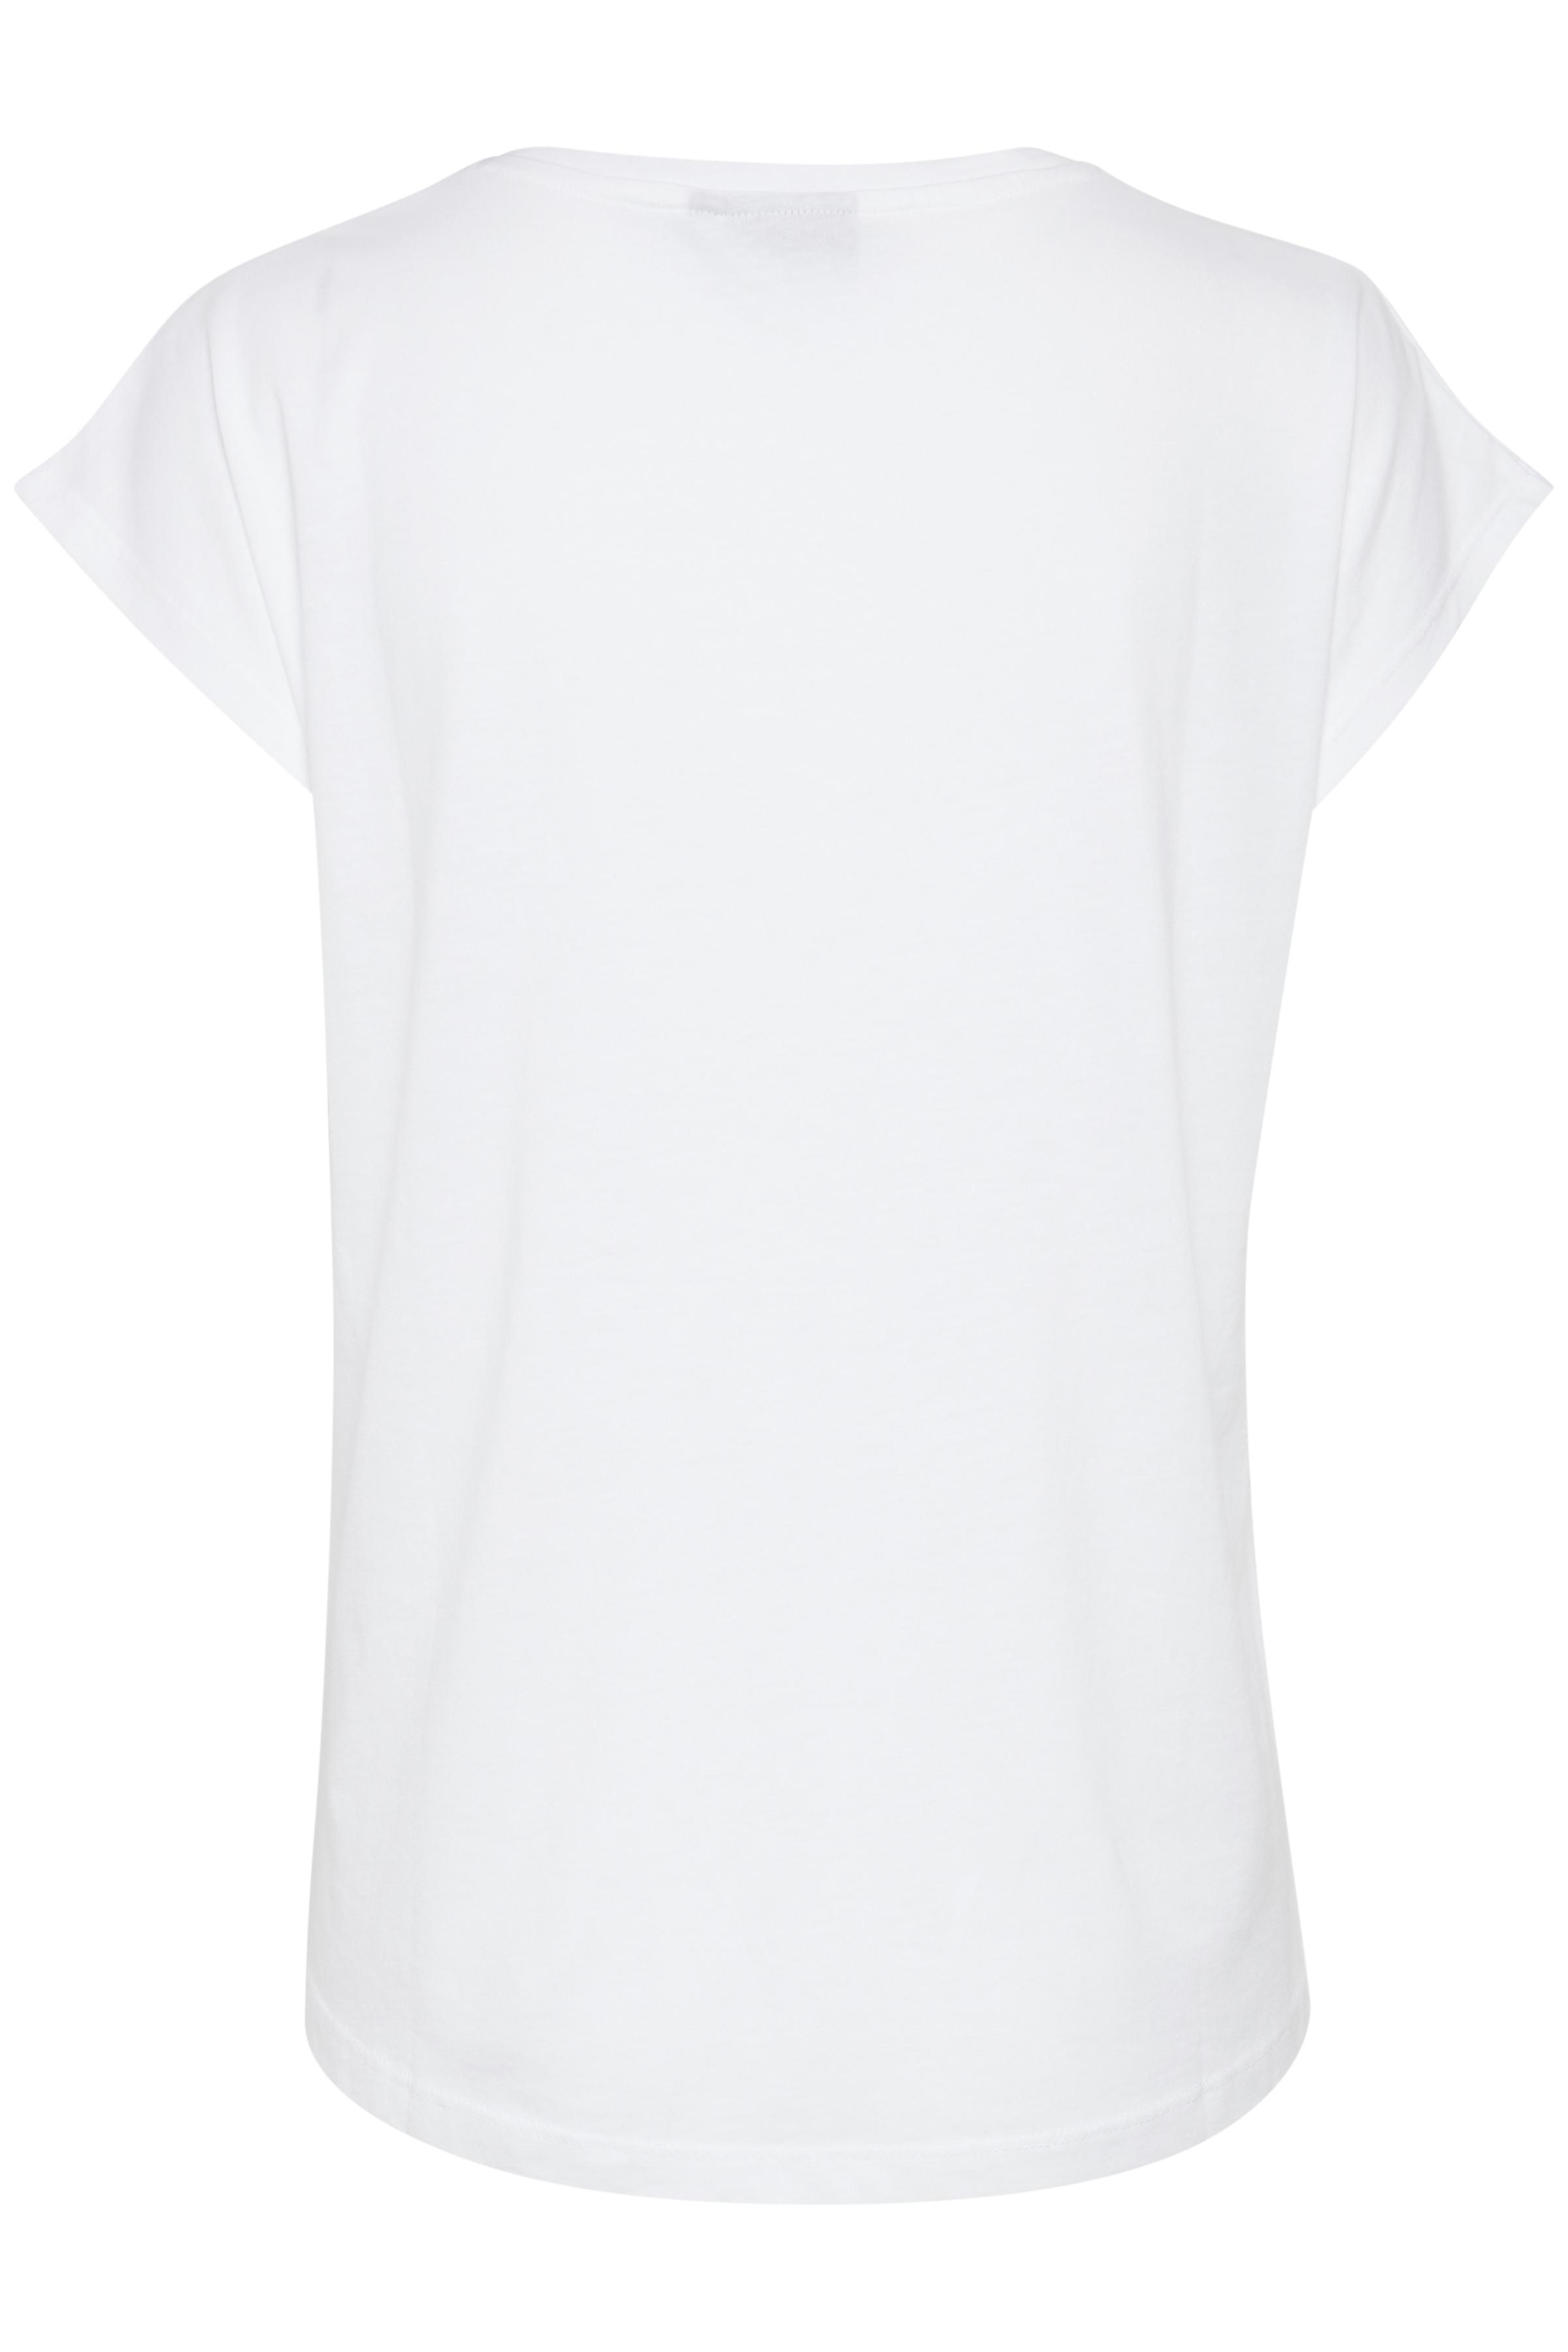 Optical White T-shirt van b.young – Koop Optical White T-shirt hier van size XS-XXL